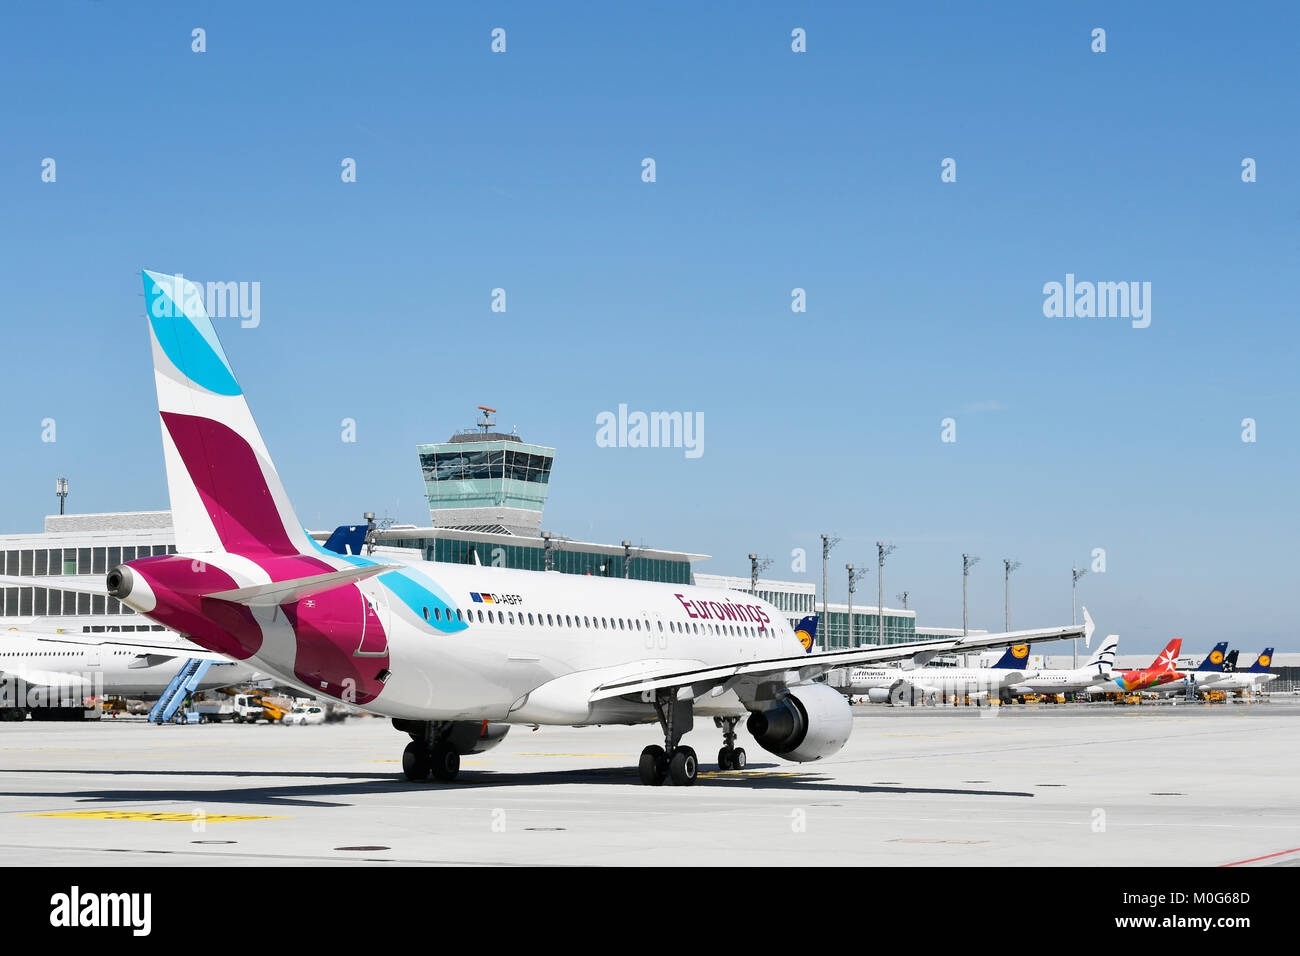 flughafen münchen eurowings terminal